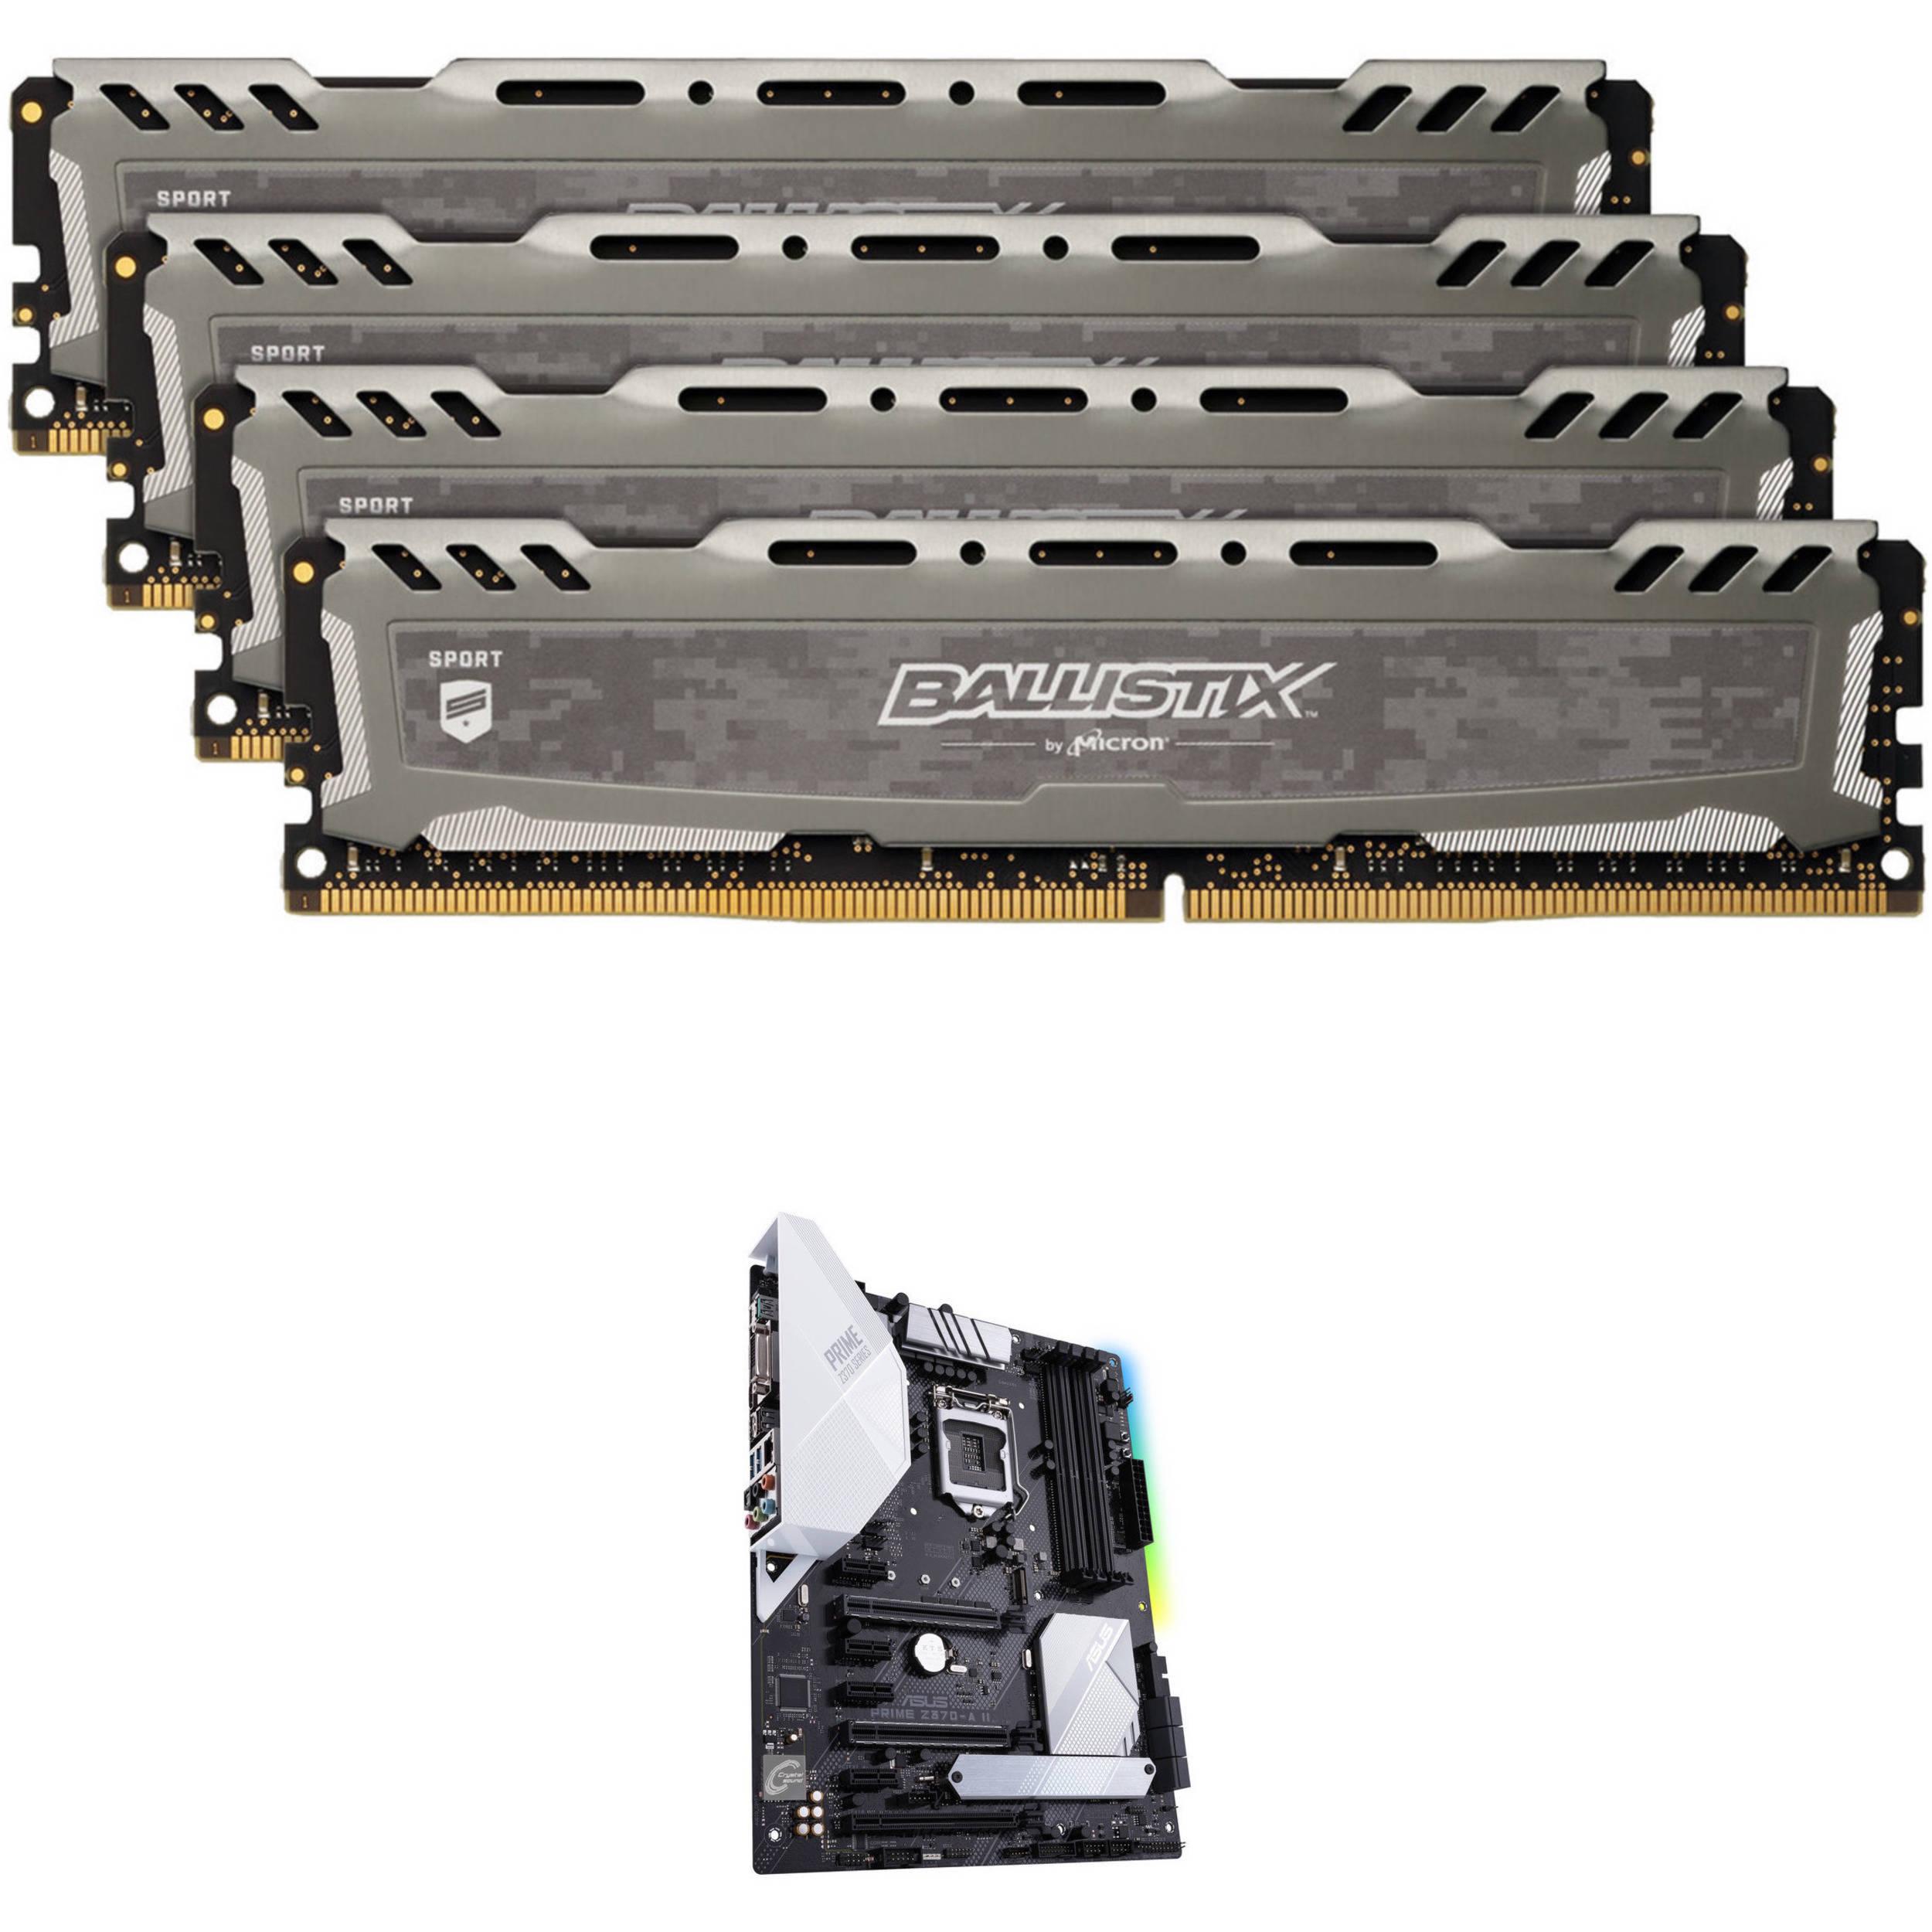 LT/32GB 8x4 KT DDR4 3200/DIM-GRY/PRIME